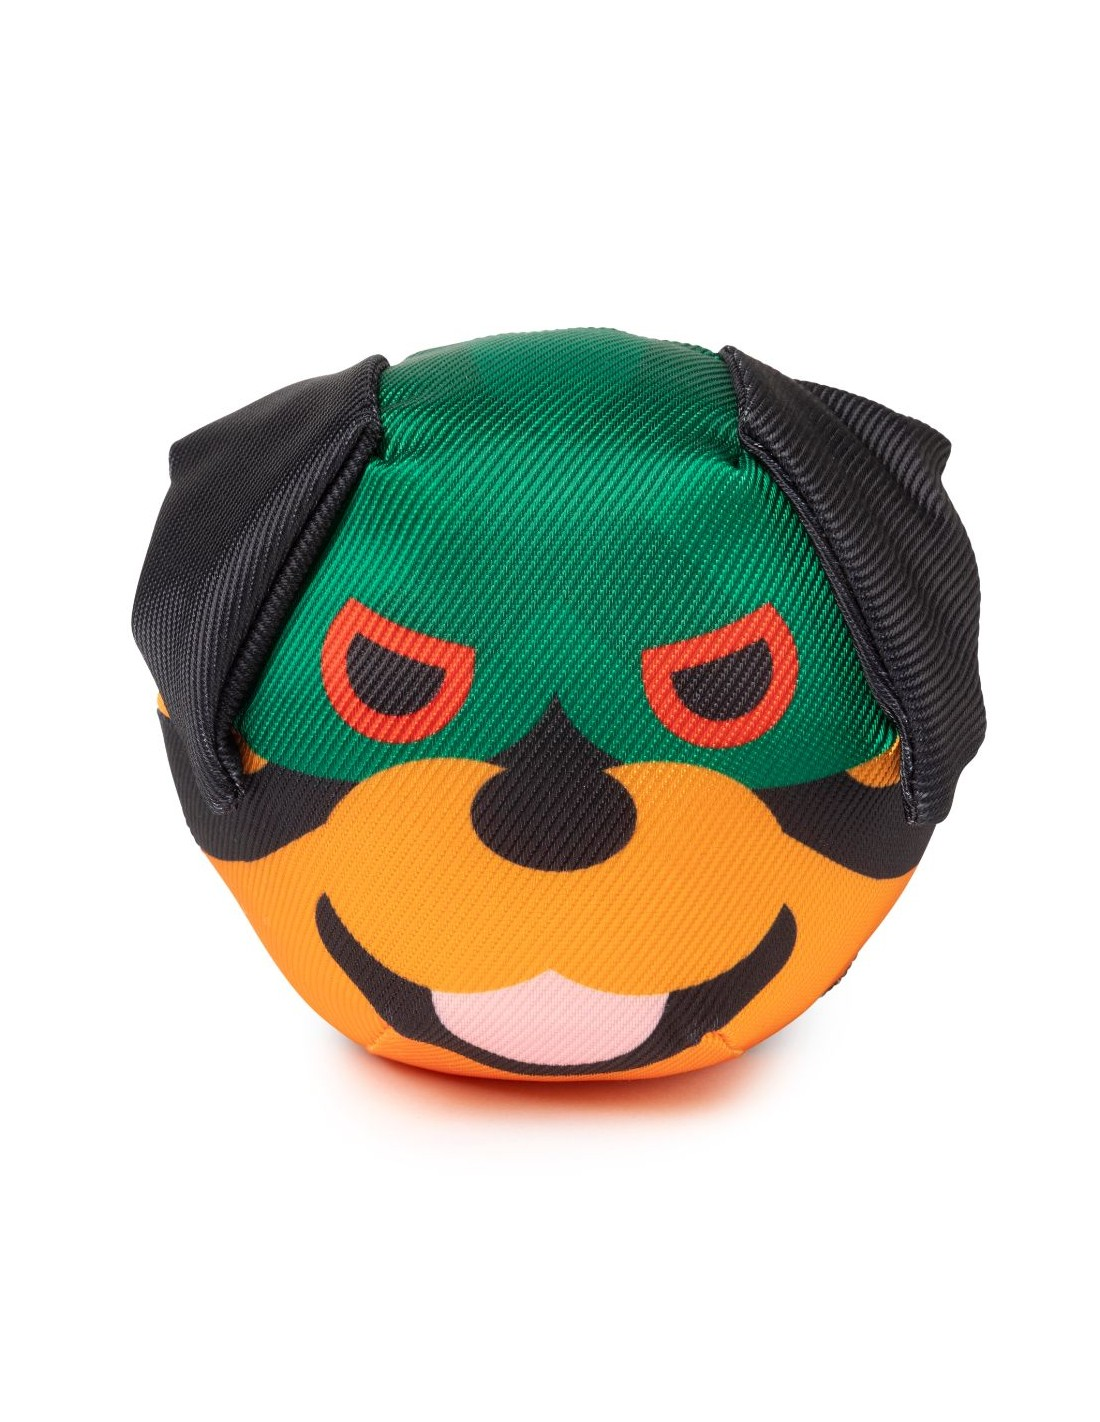 FuzzYard Toy - Doggoforce Rumble